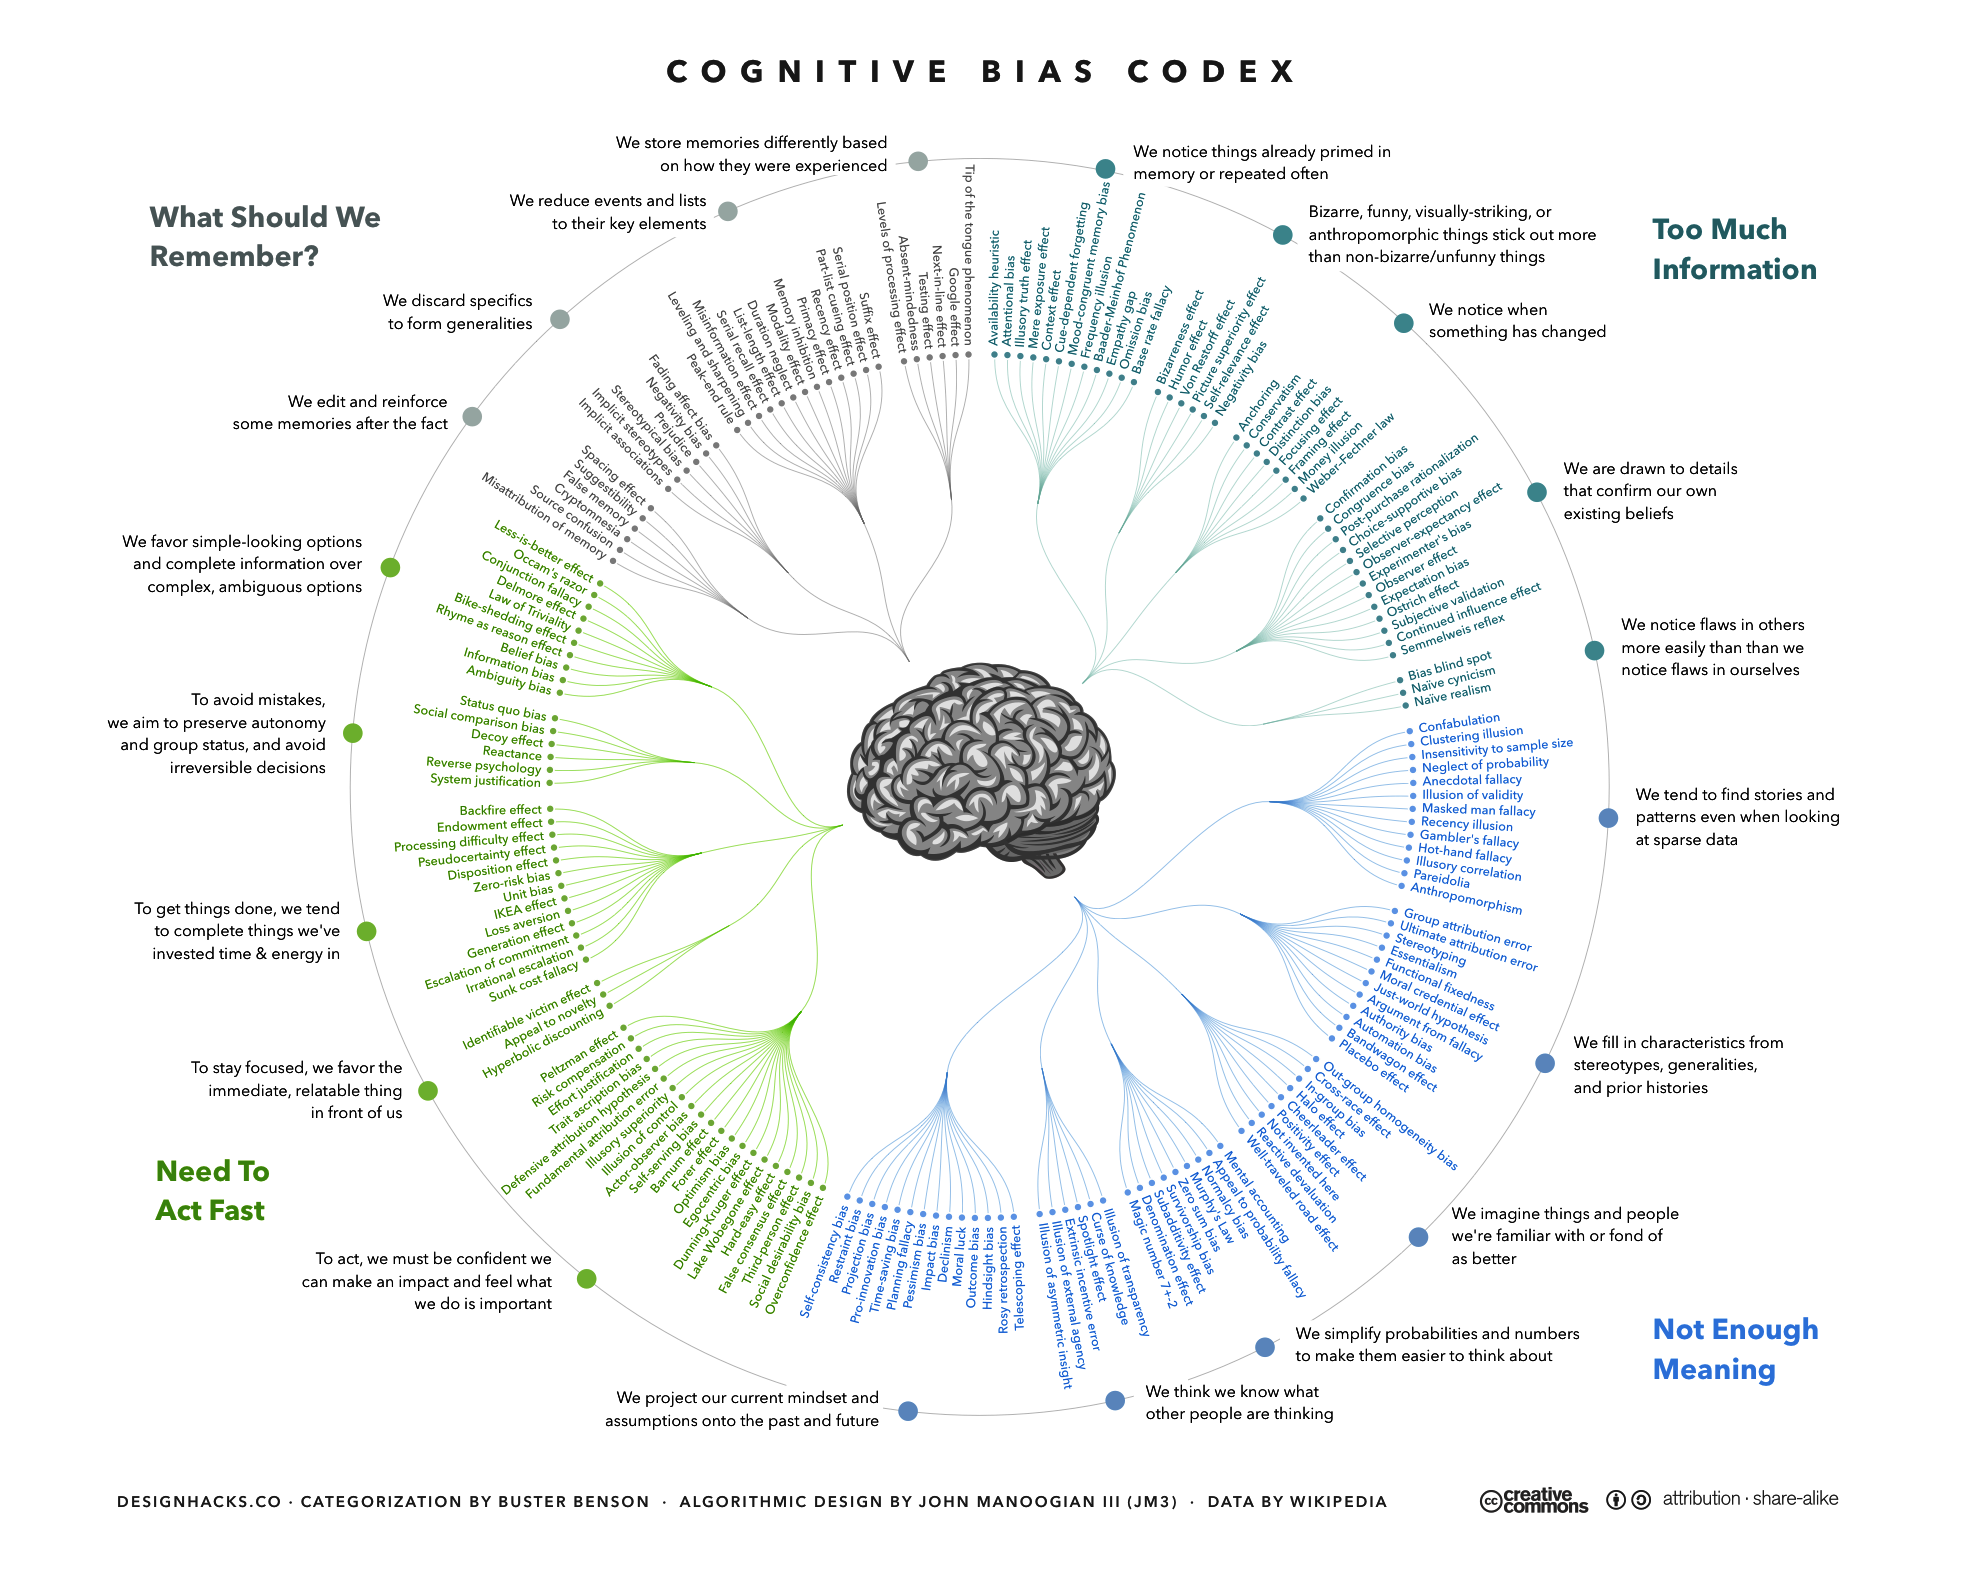 The Cognitive Bias Codex A Visual Of 180 Cognitive